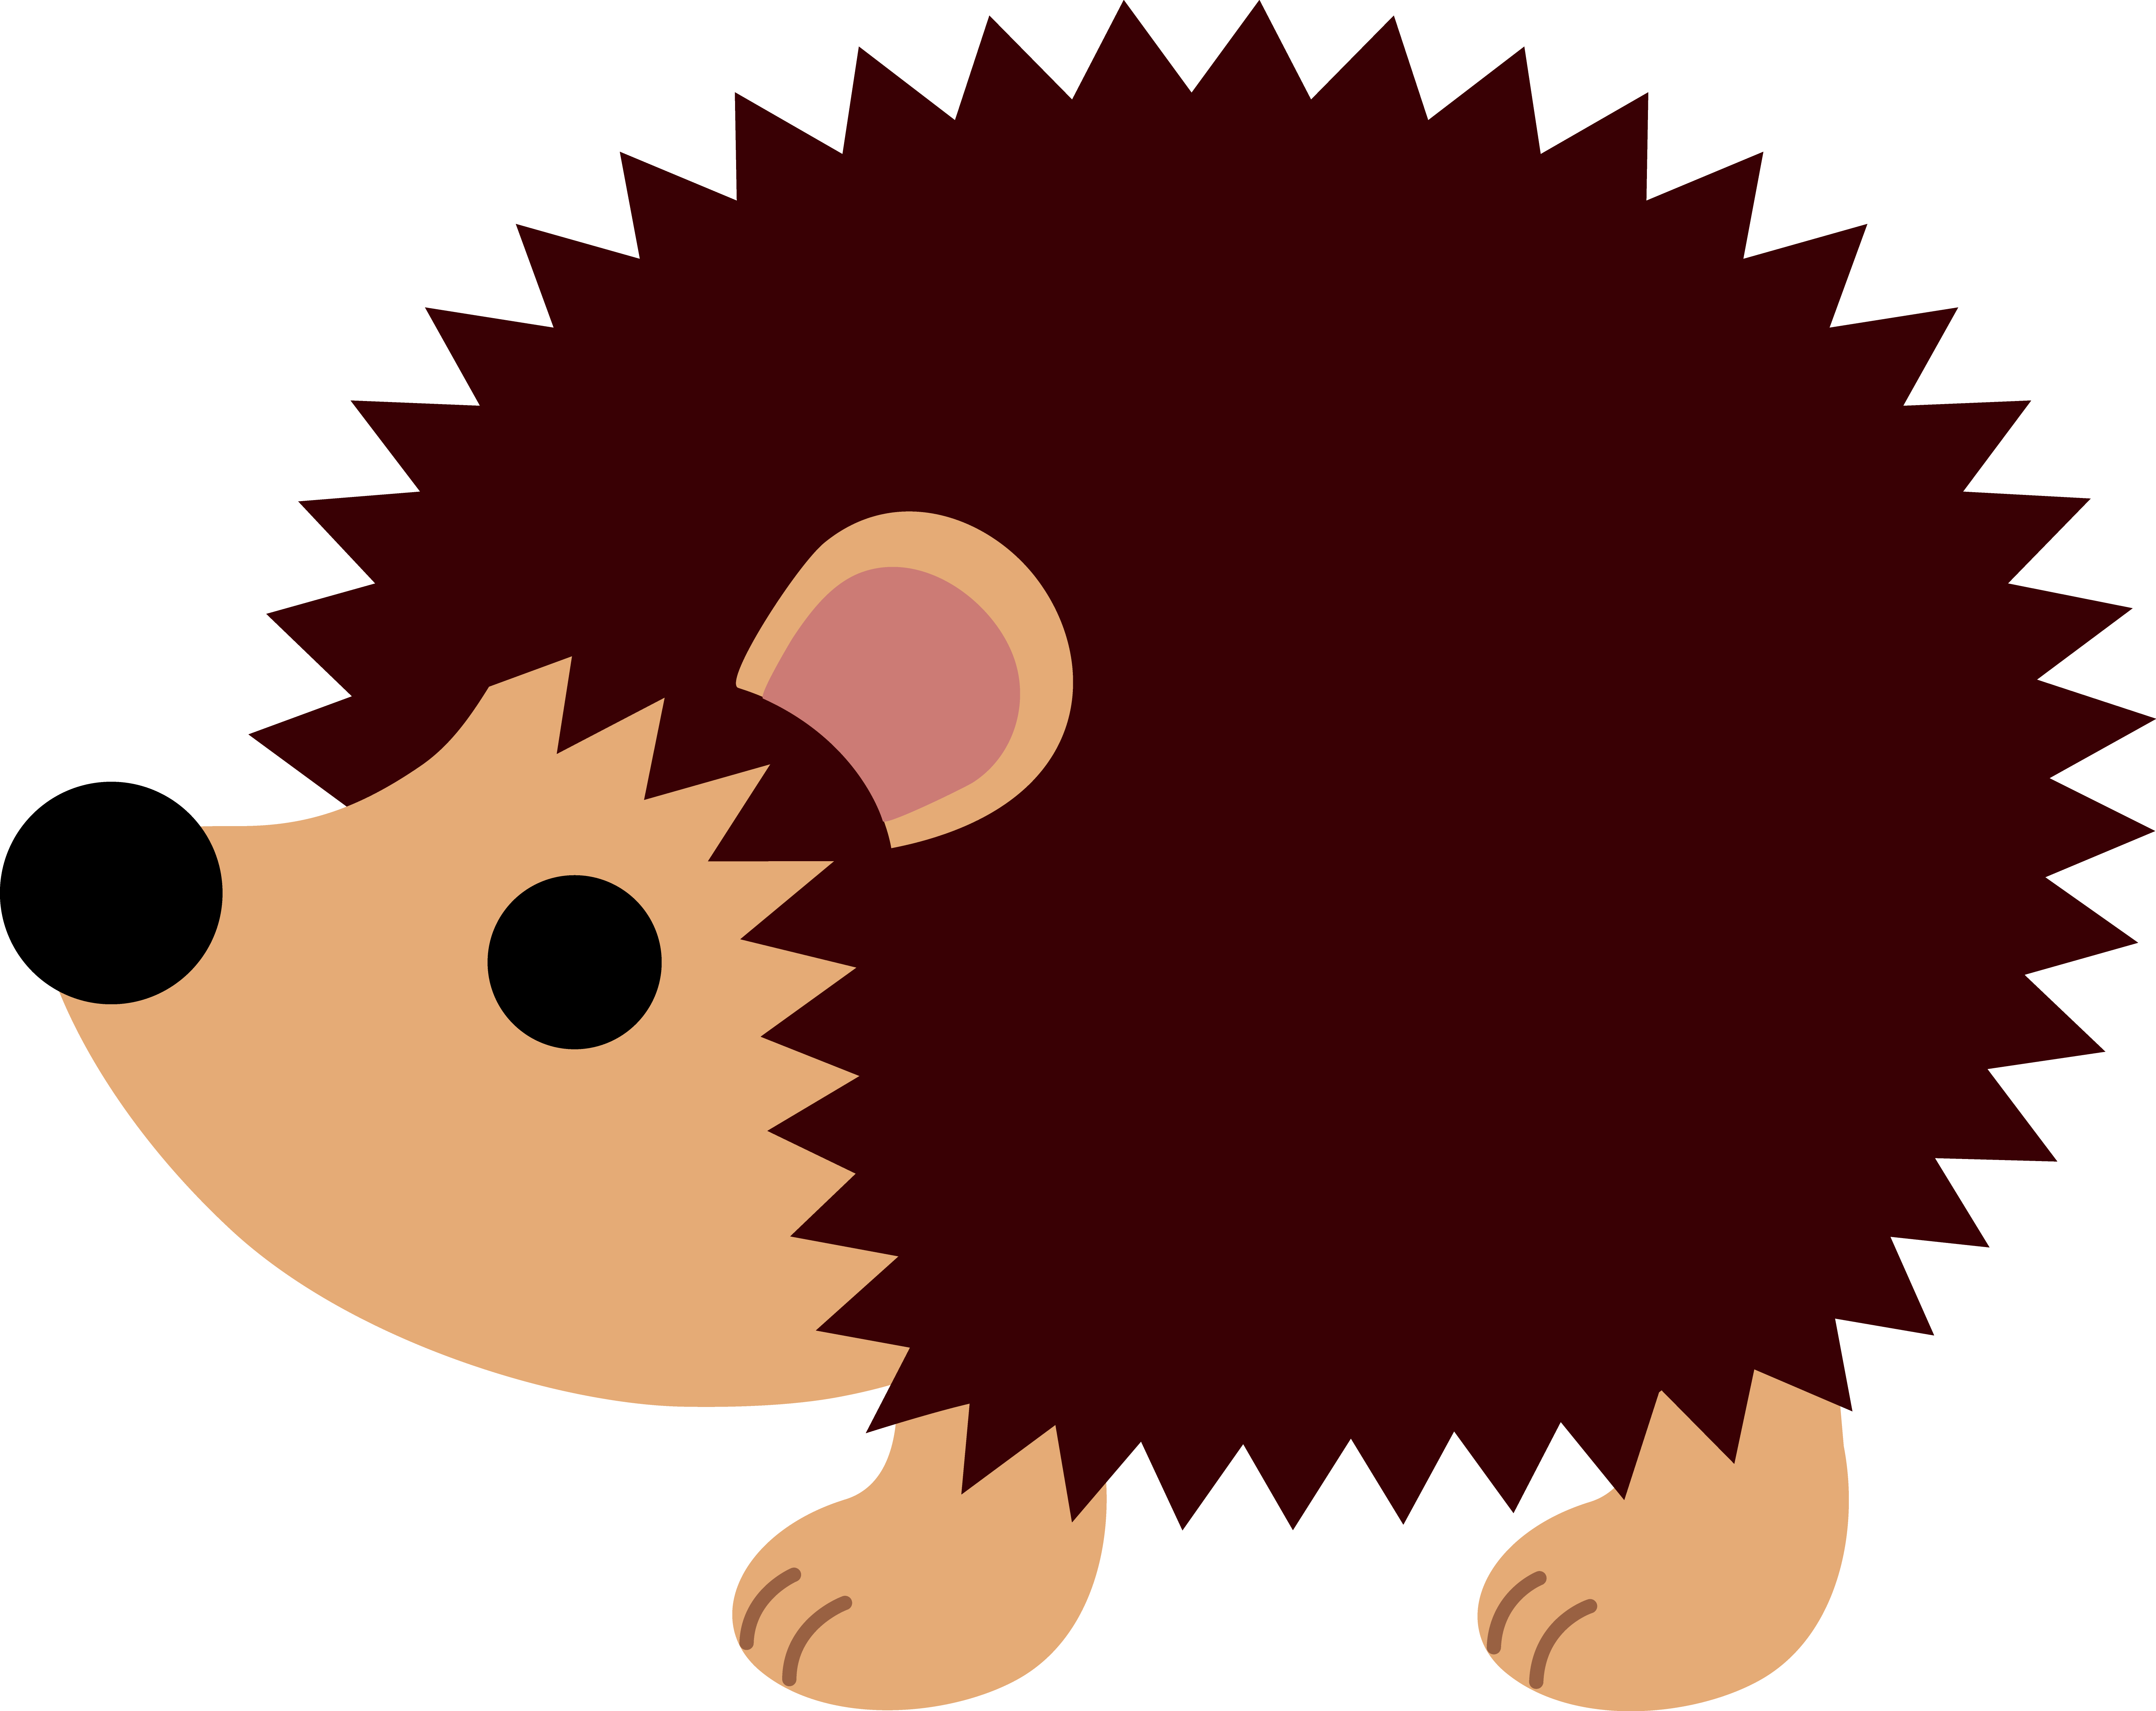 Free Hedgehog Cliparts, Download Free Clip Art, Free Clip.